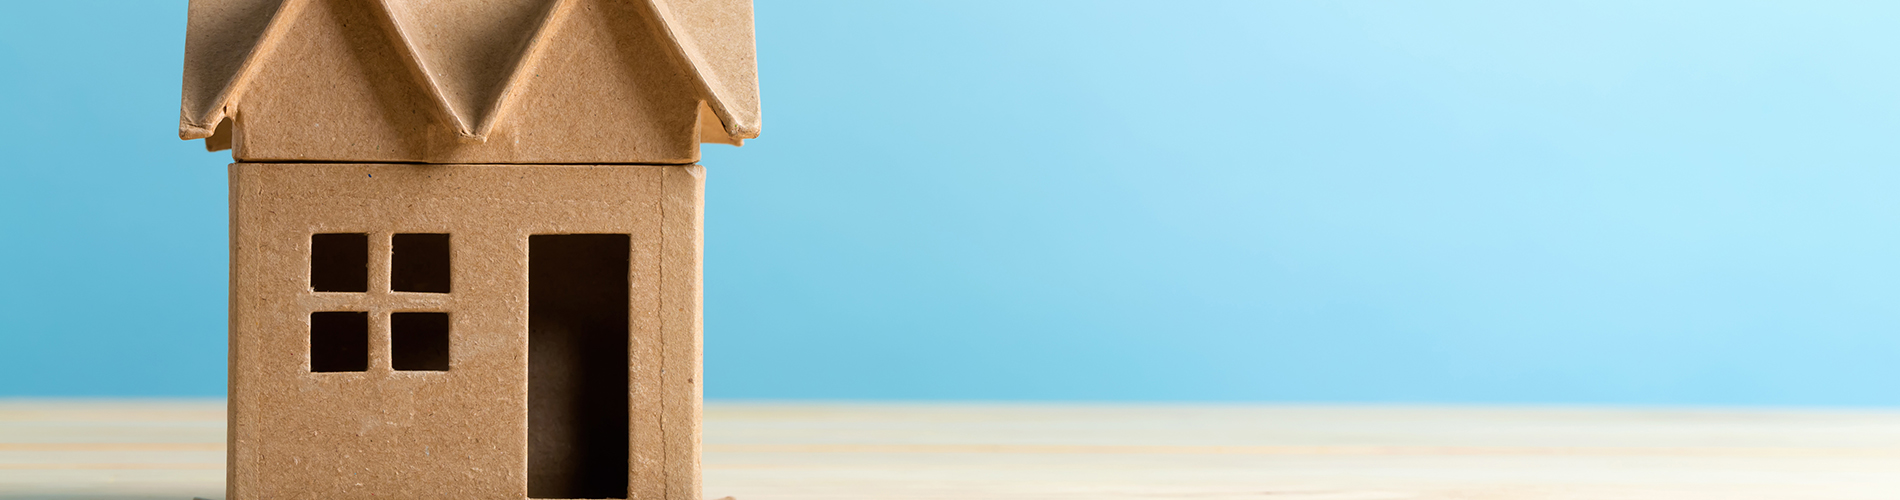 Conveyancing Property | Boylan Lawyers